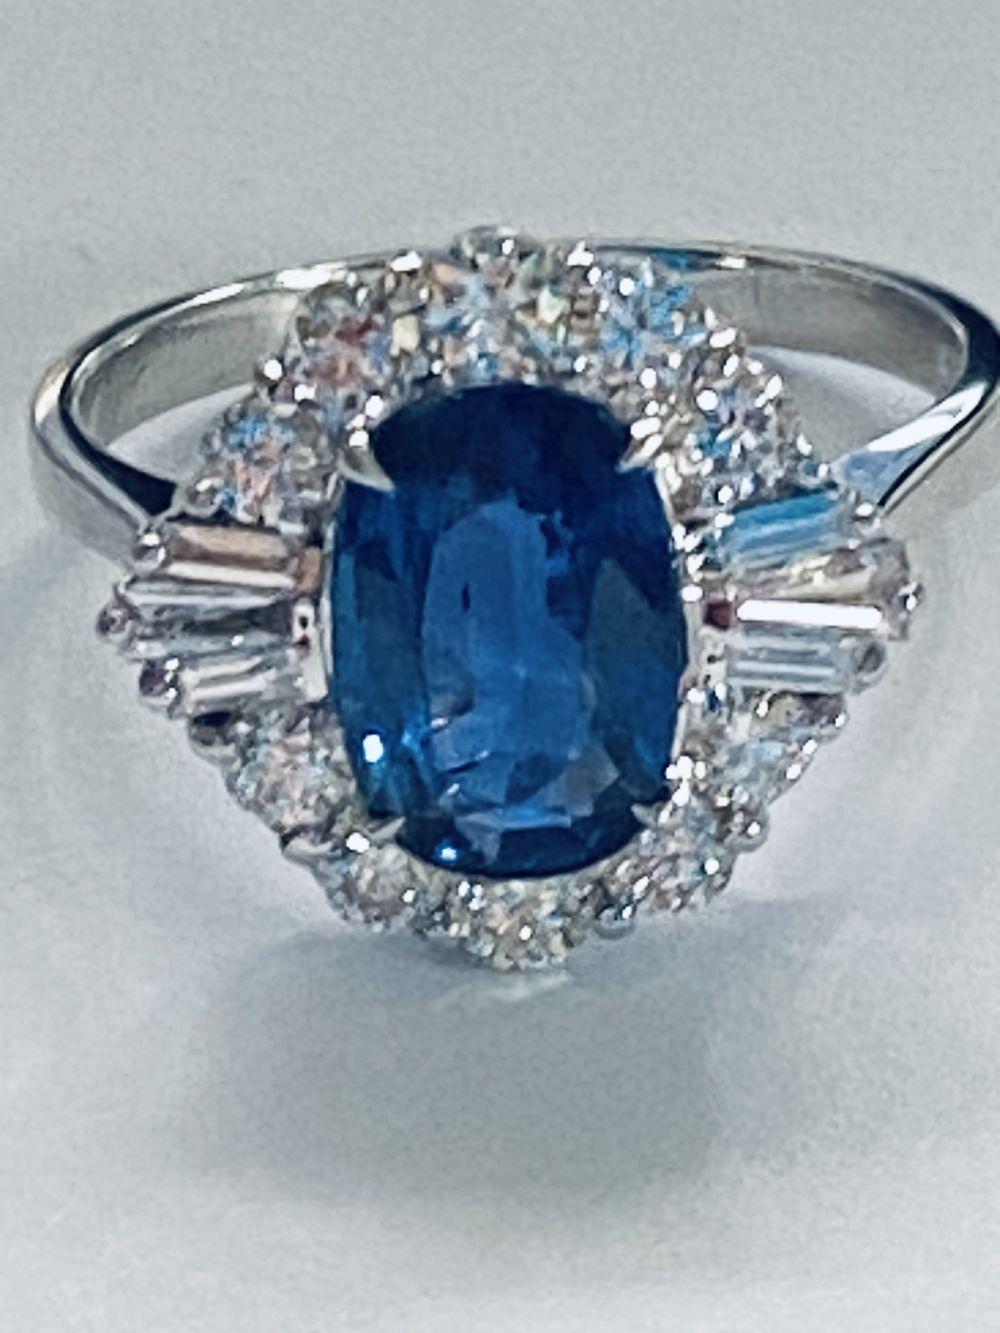 ART DECO DIAMOND AND CEYLON SAPPHIRE CLUSTER RING - Image 6 of 7